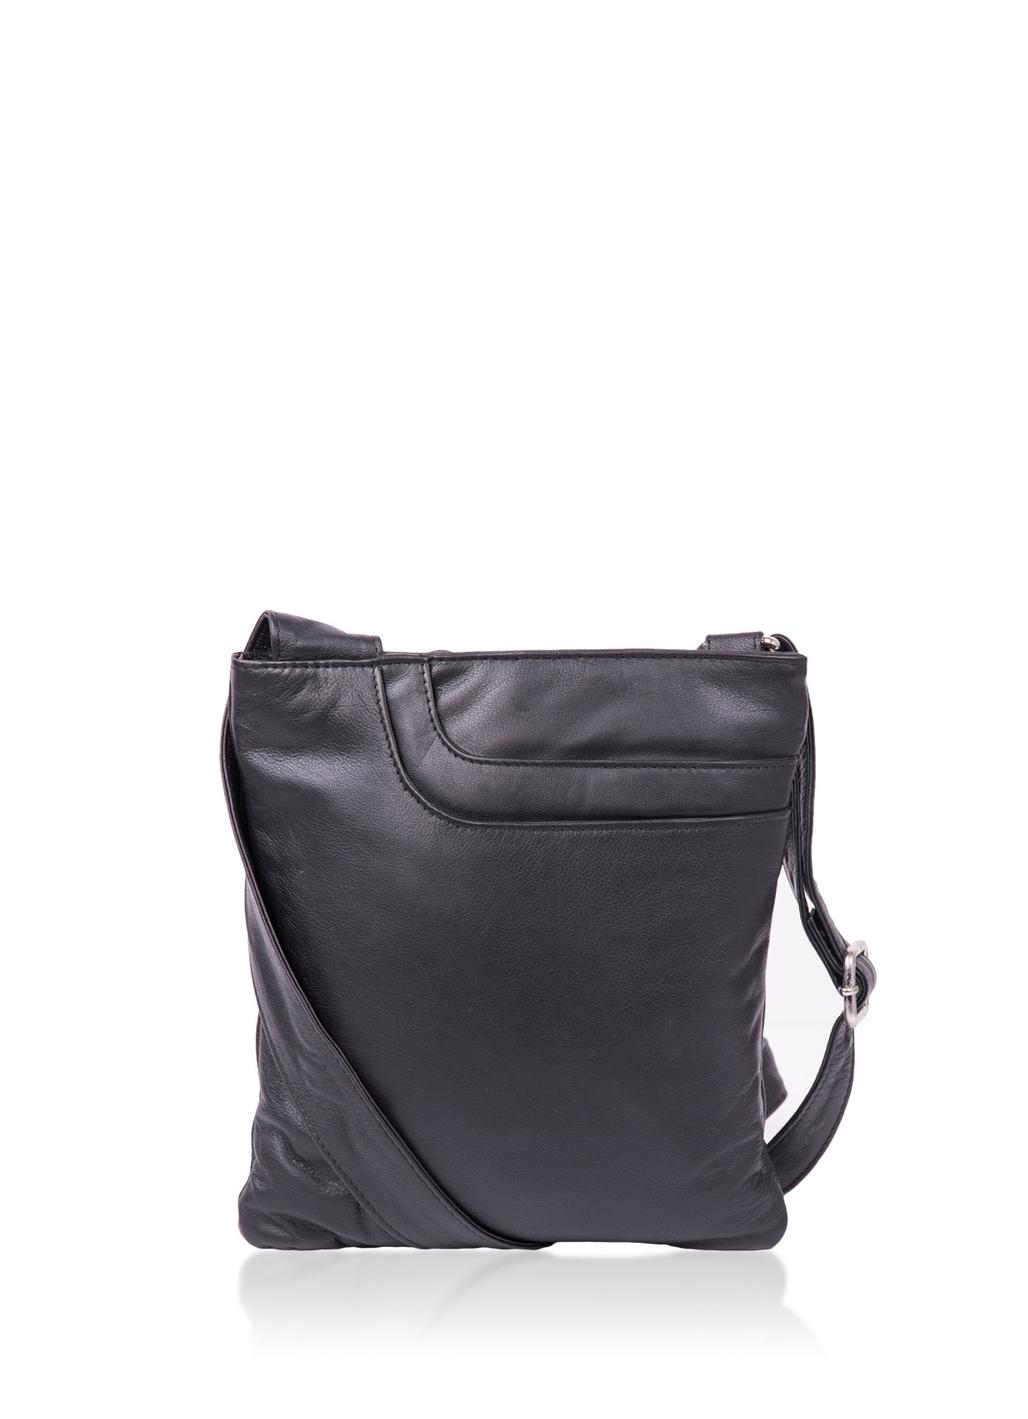 Alexsis Leather Cross Body Bag in Black -